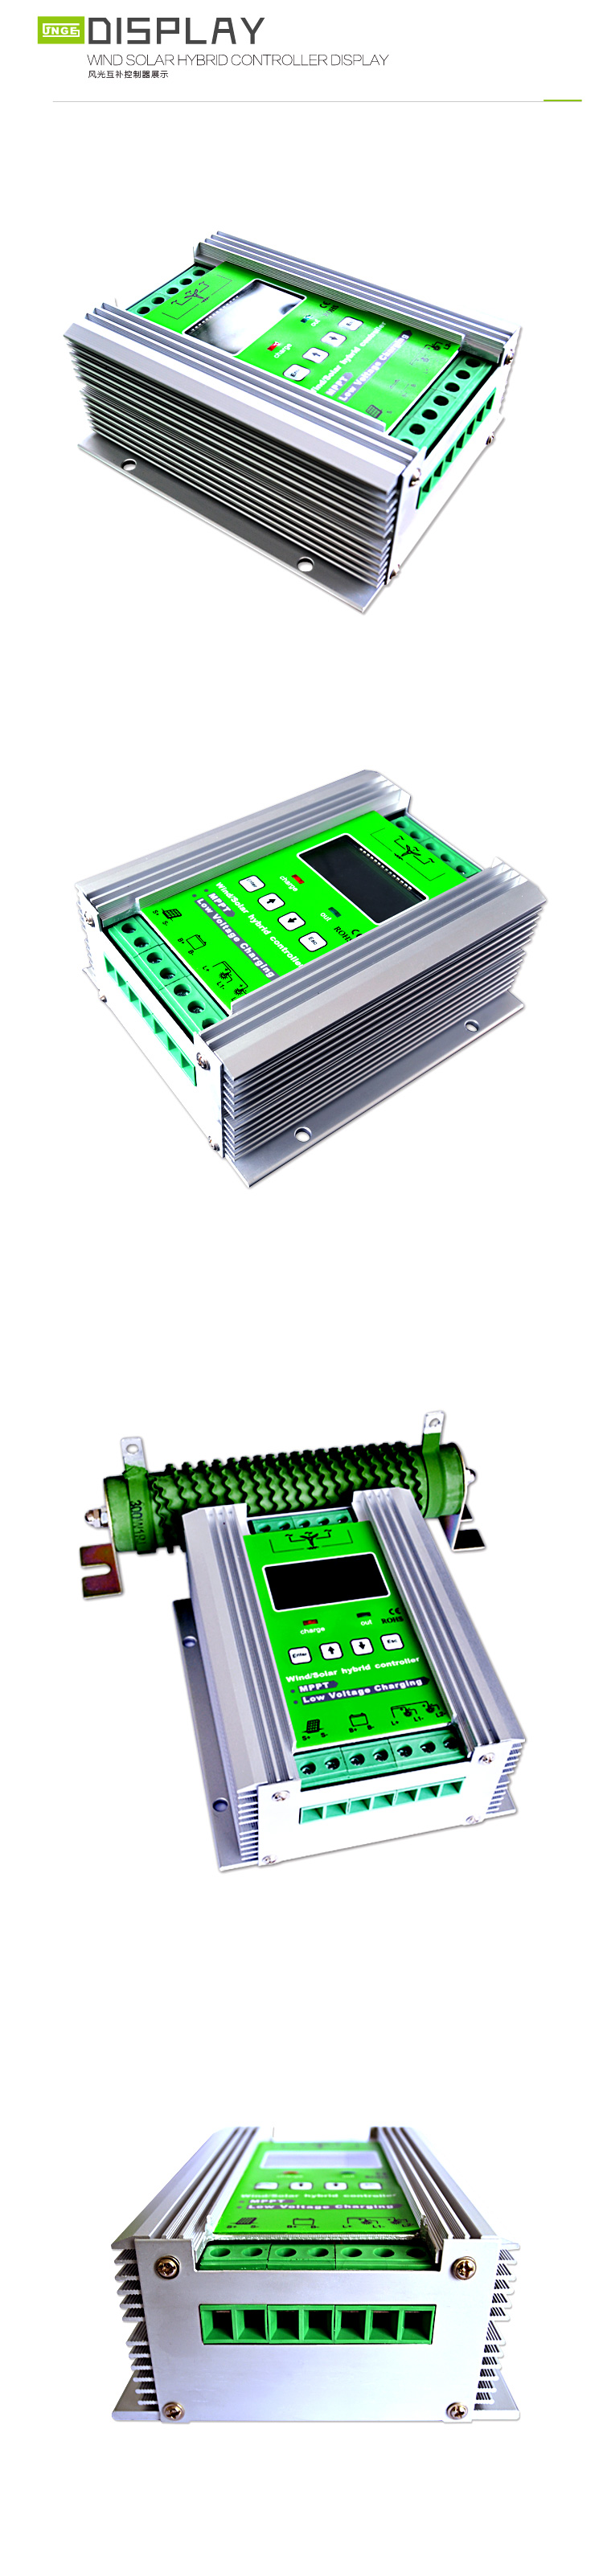 800w Mppt Wind Solar Hybrid Controller 12v 24v Auto Boost 500w Turbine Dumpload Charge High End Type 07